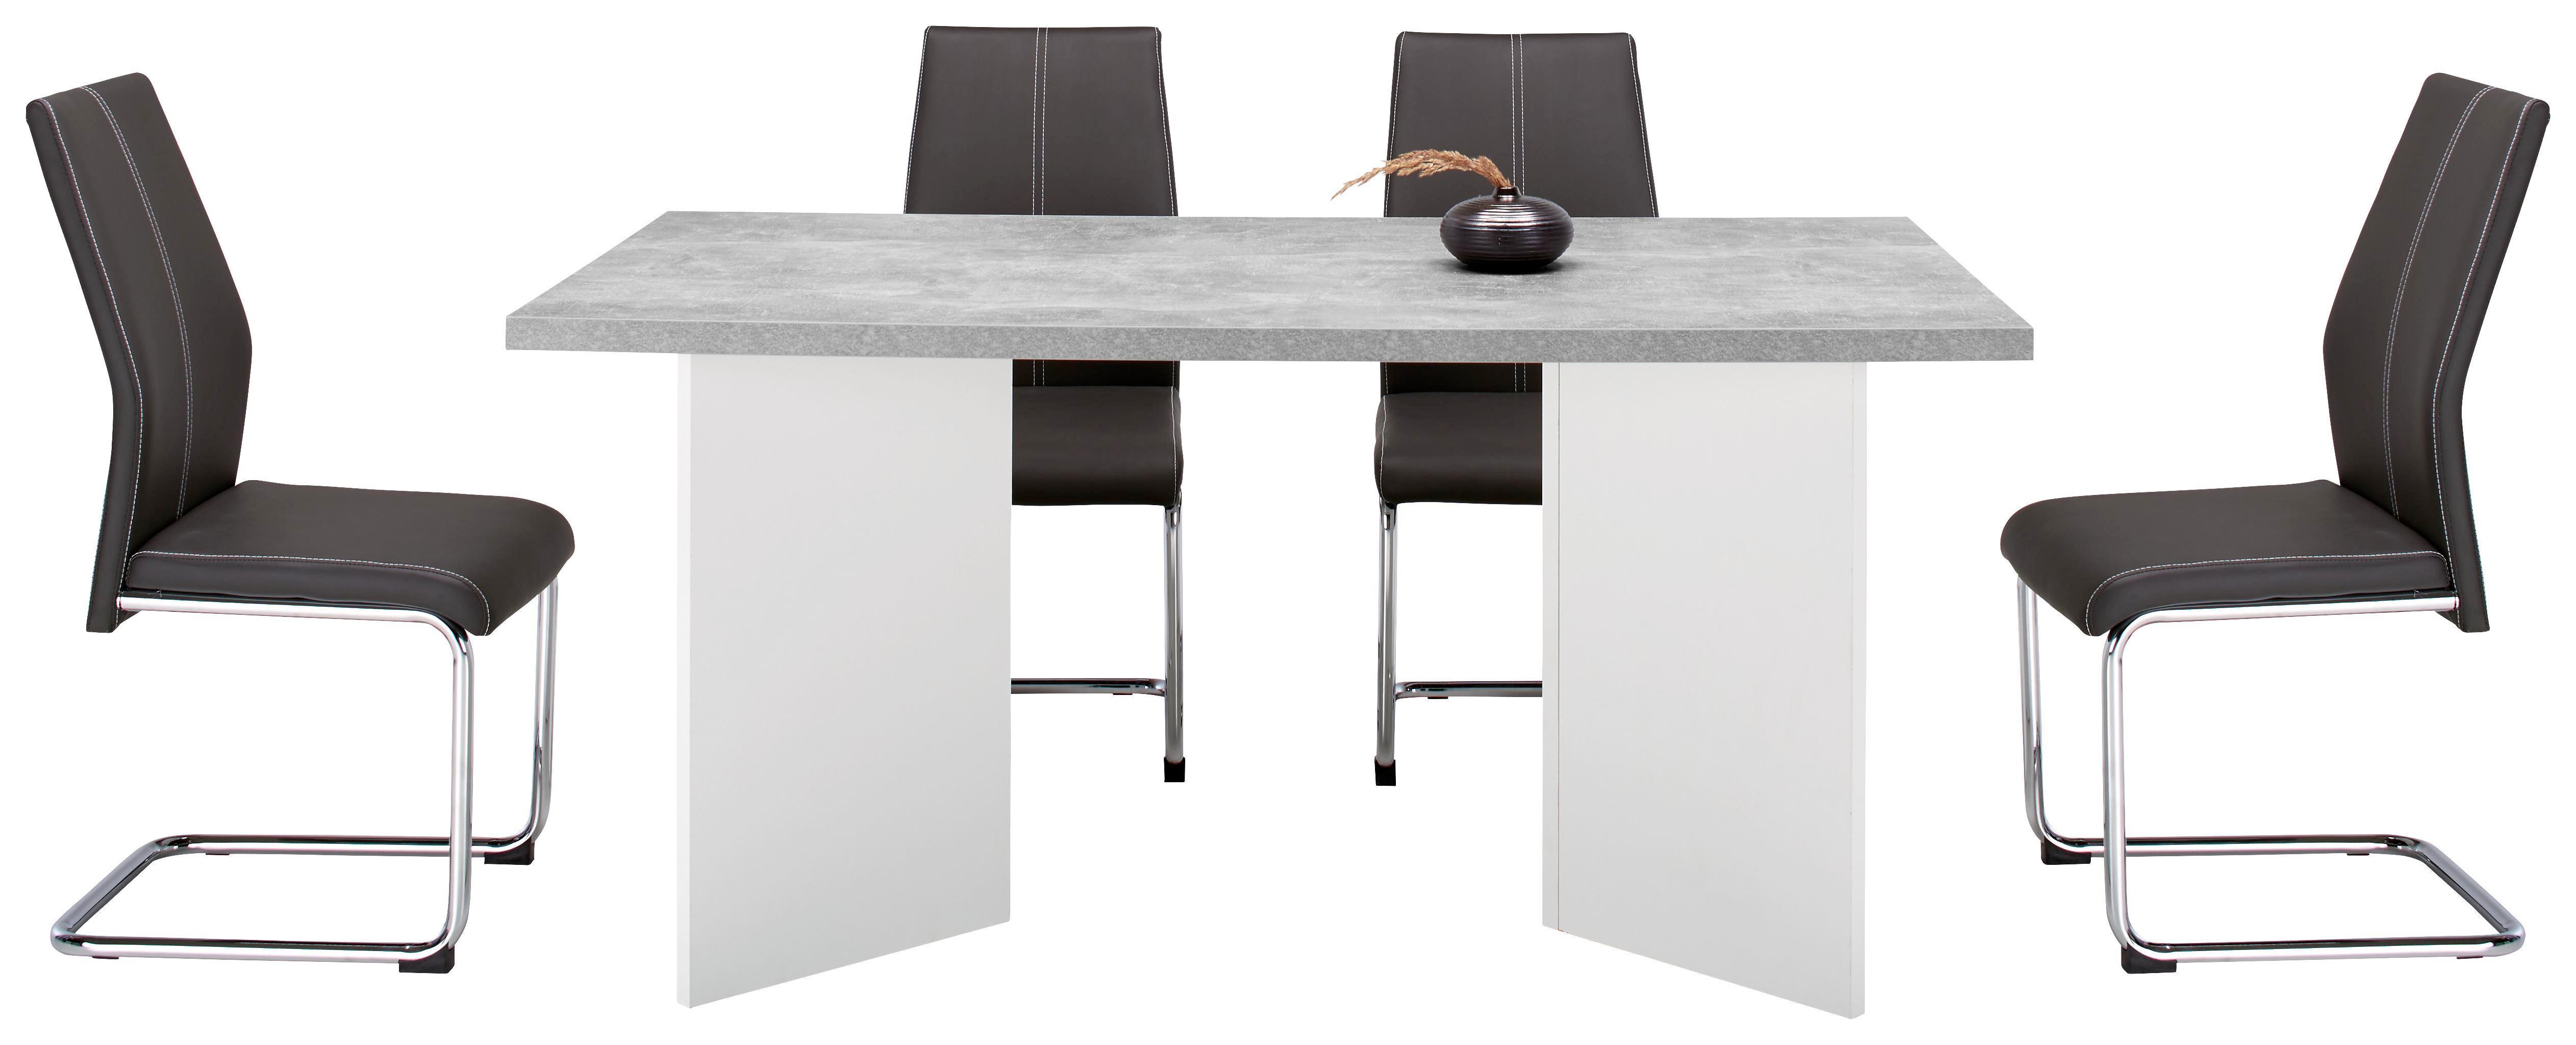 Schwingstuhl in Grau - Chromfarben/Weiß, Textil/Metall (44/96/57cm) - MÖMAX modern living